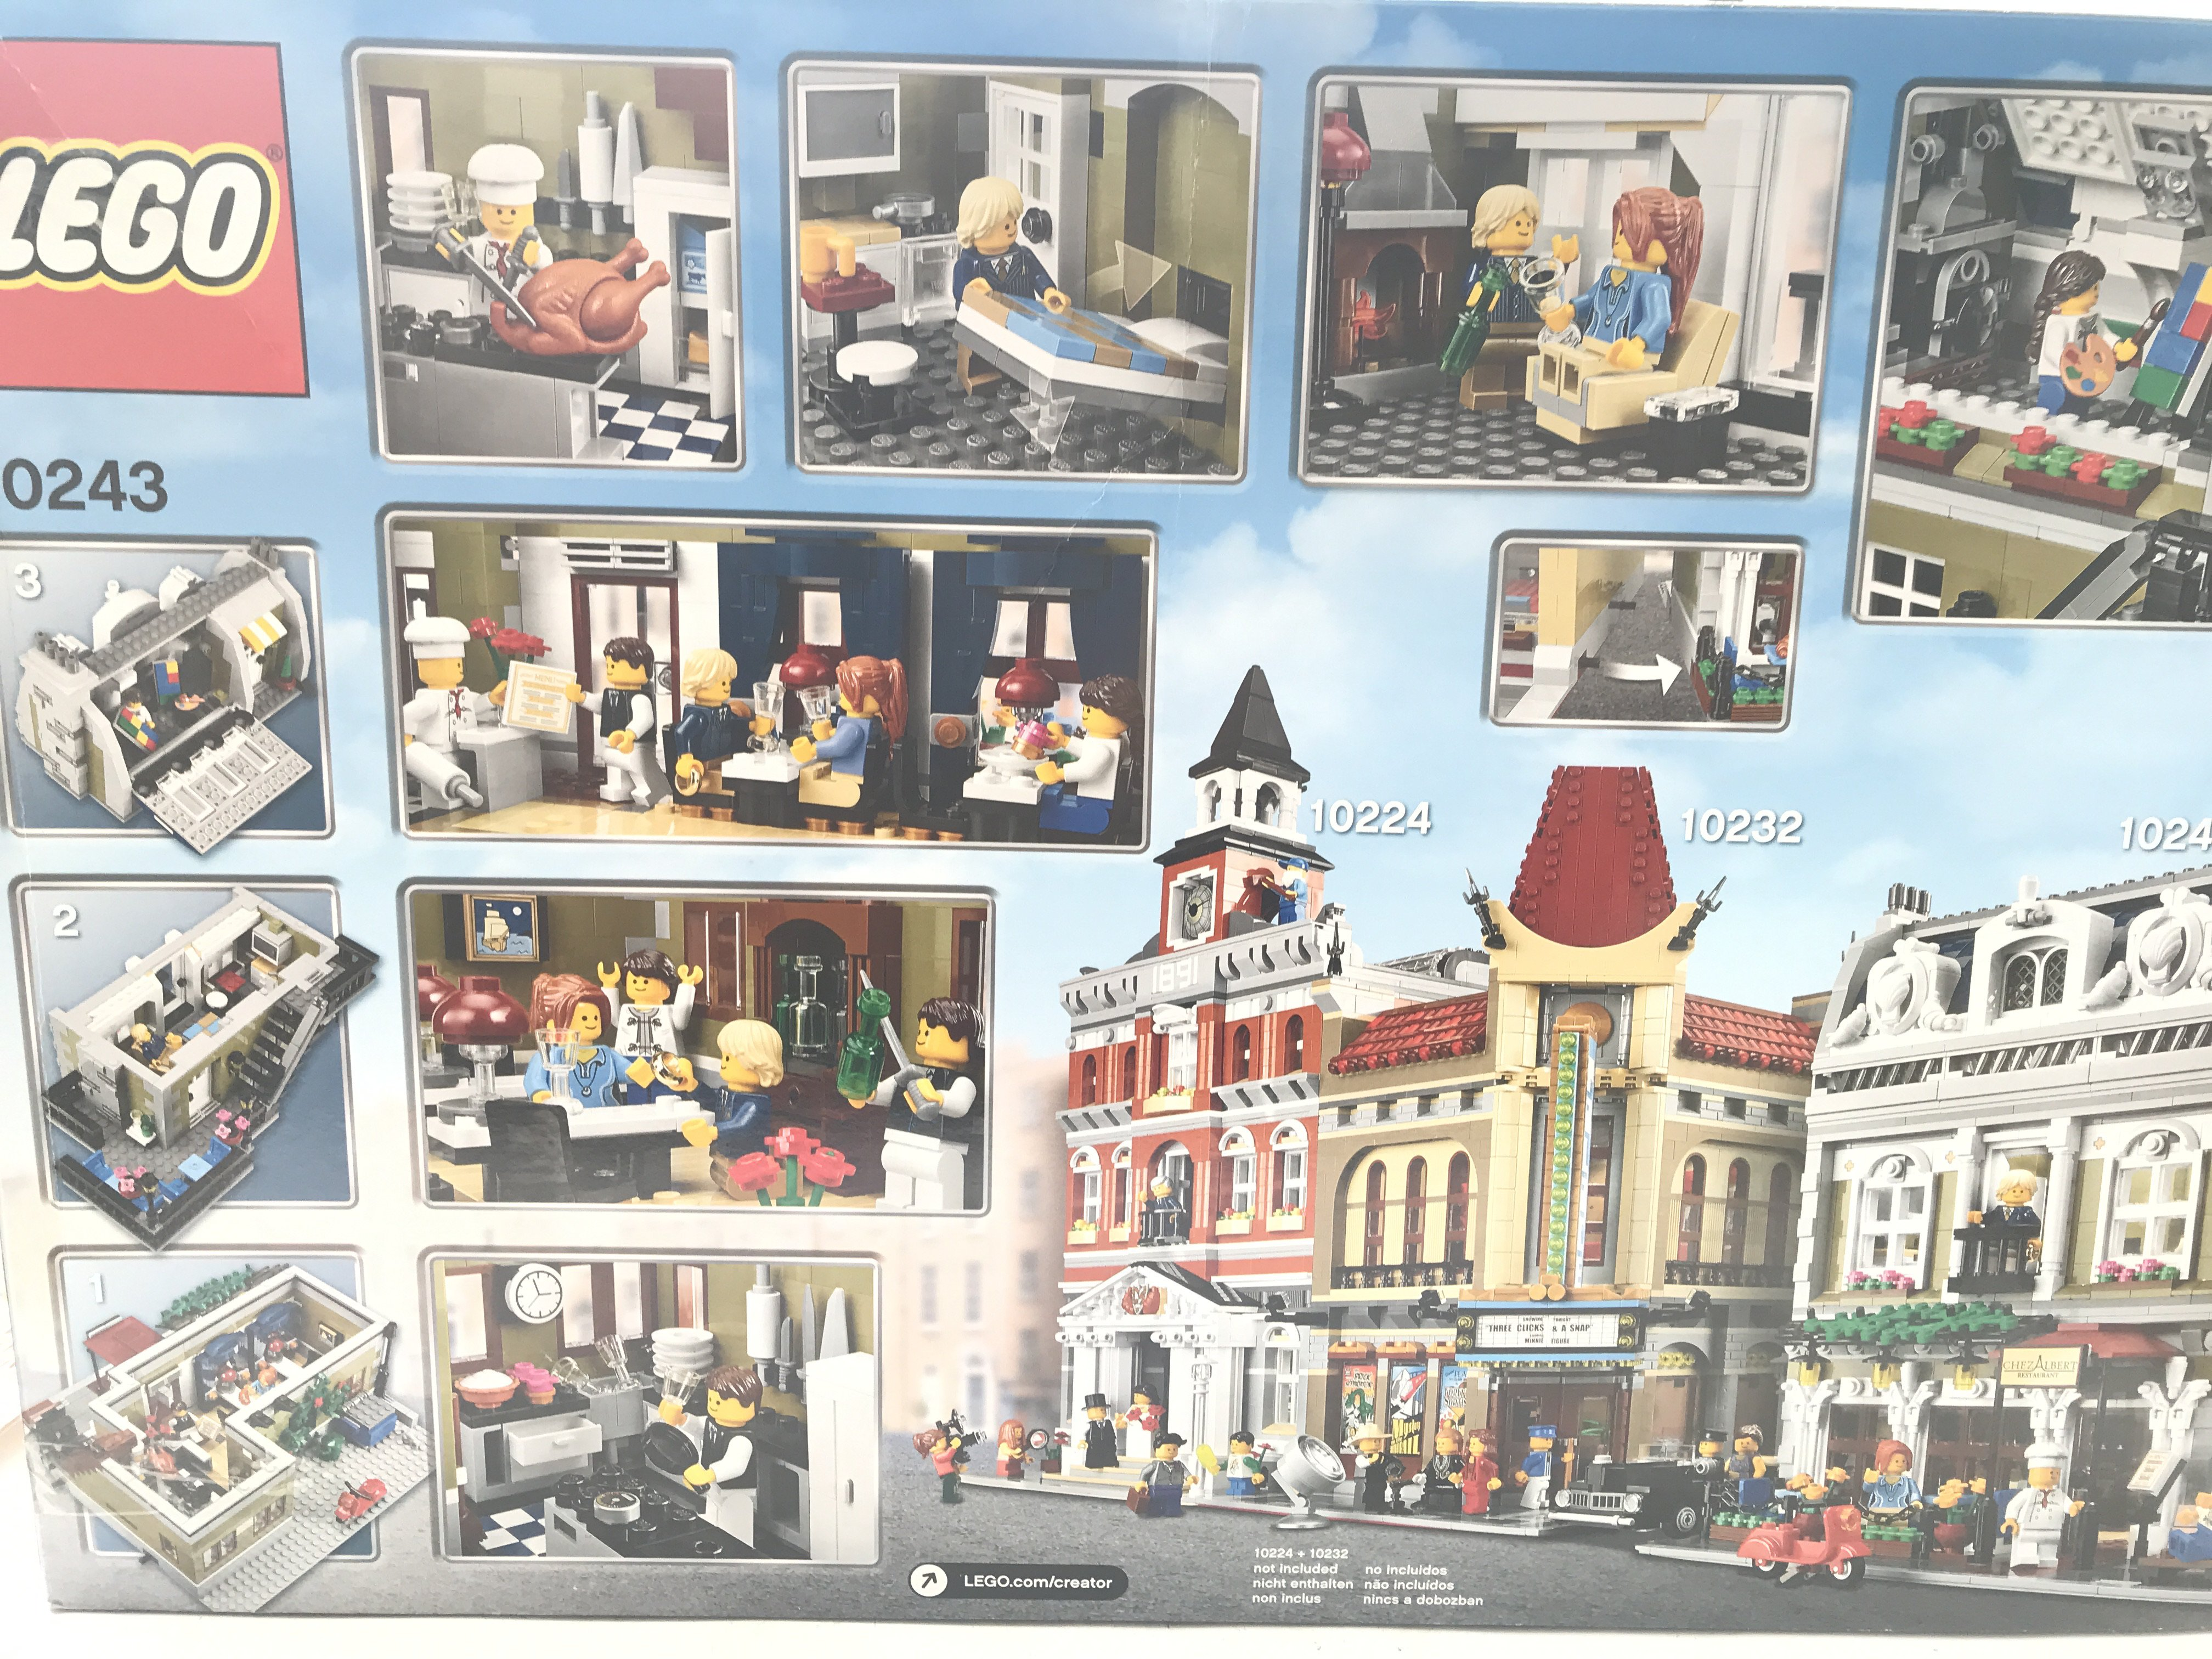 A Boxed Lego Parisian Restaurant 2469 pcs #10243. - Image 2 of 2